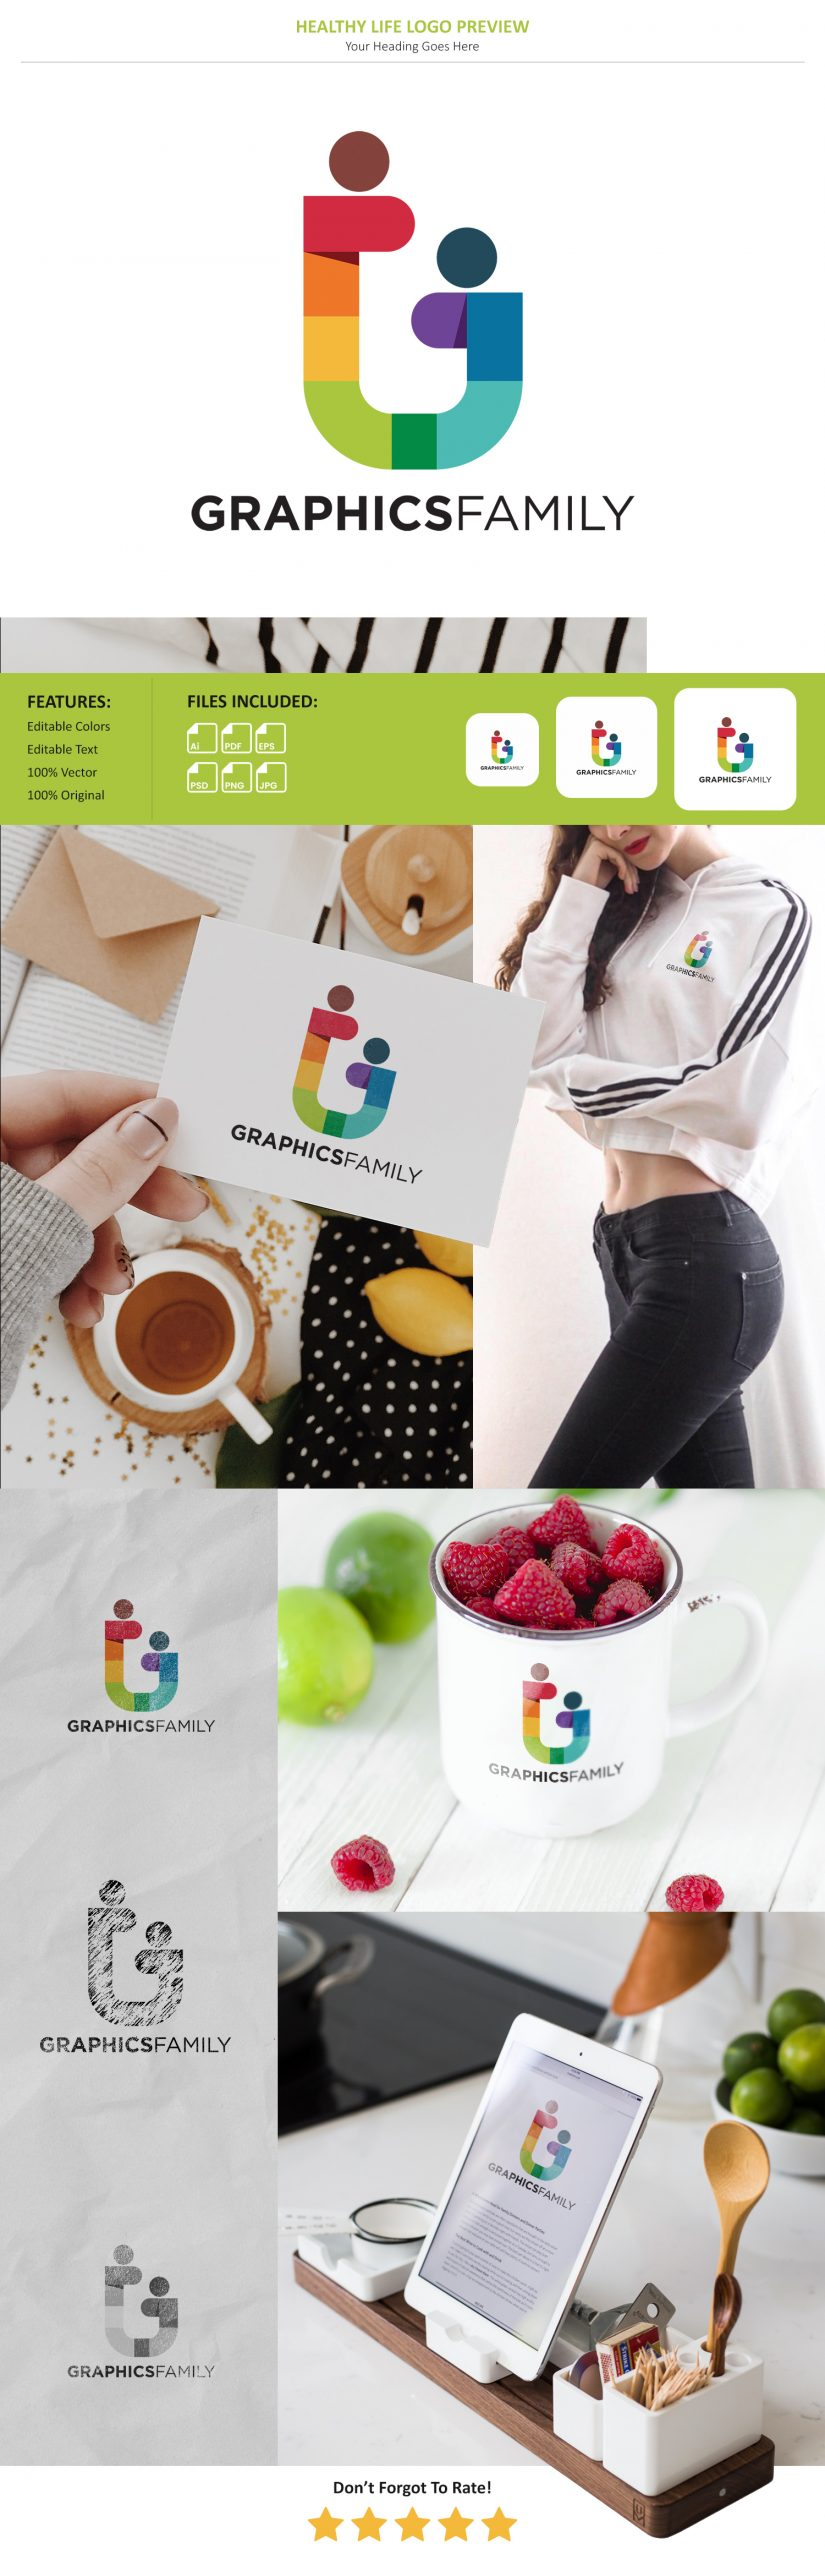 Healthy Life Logo Preview Mockup